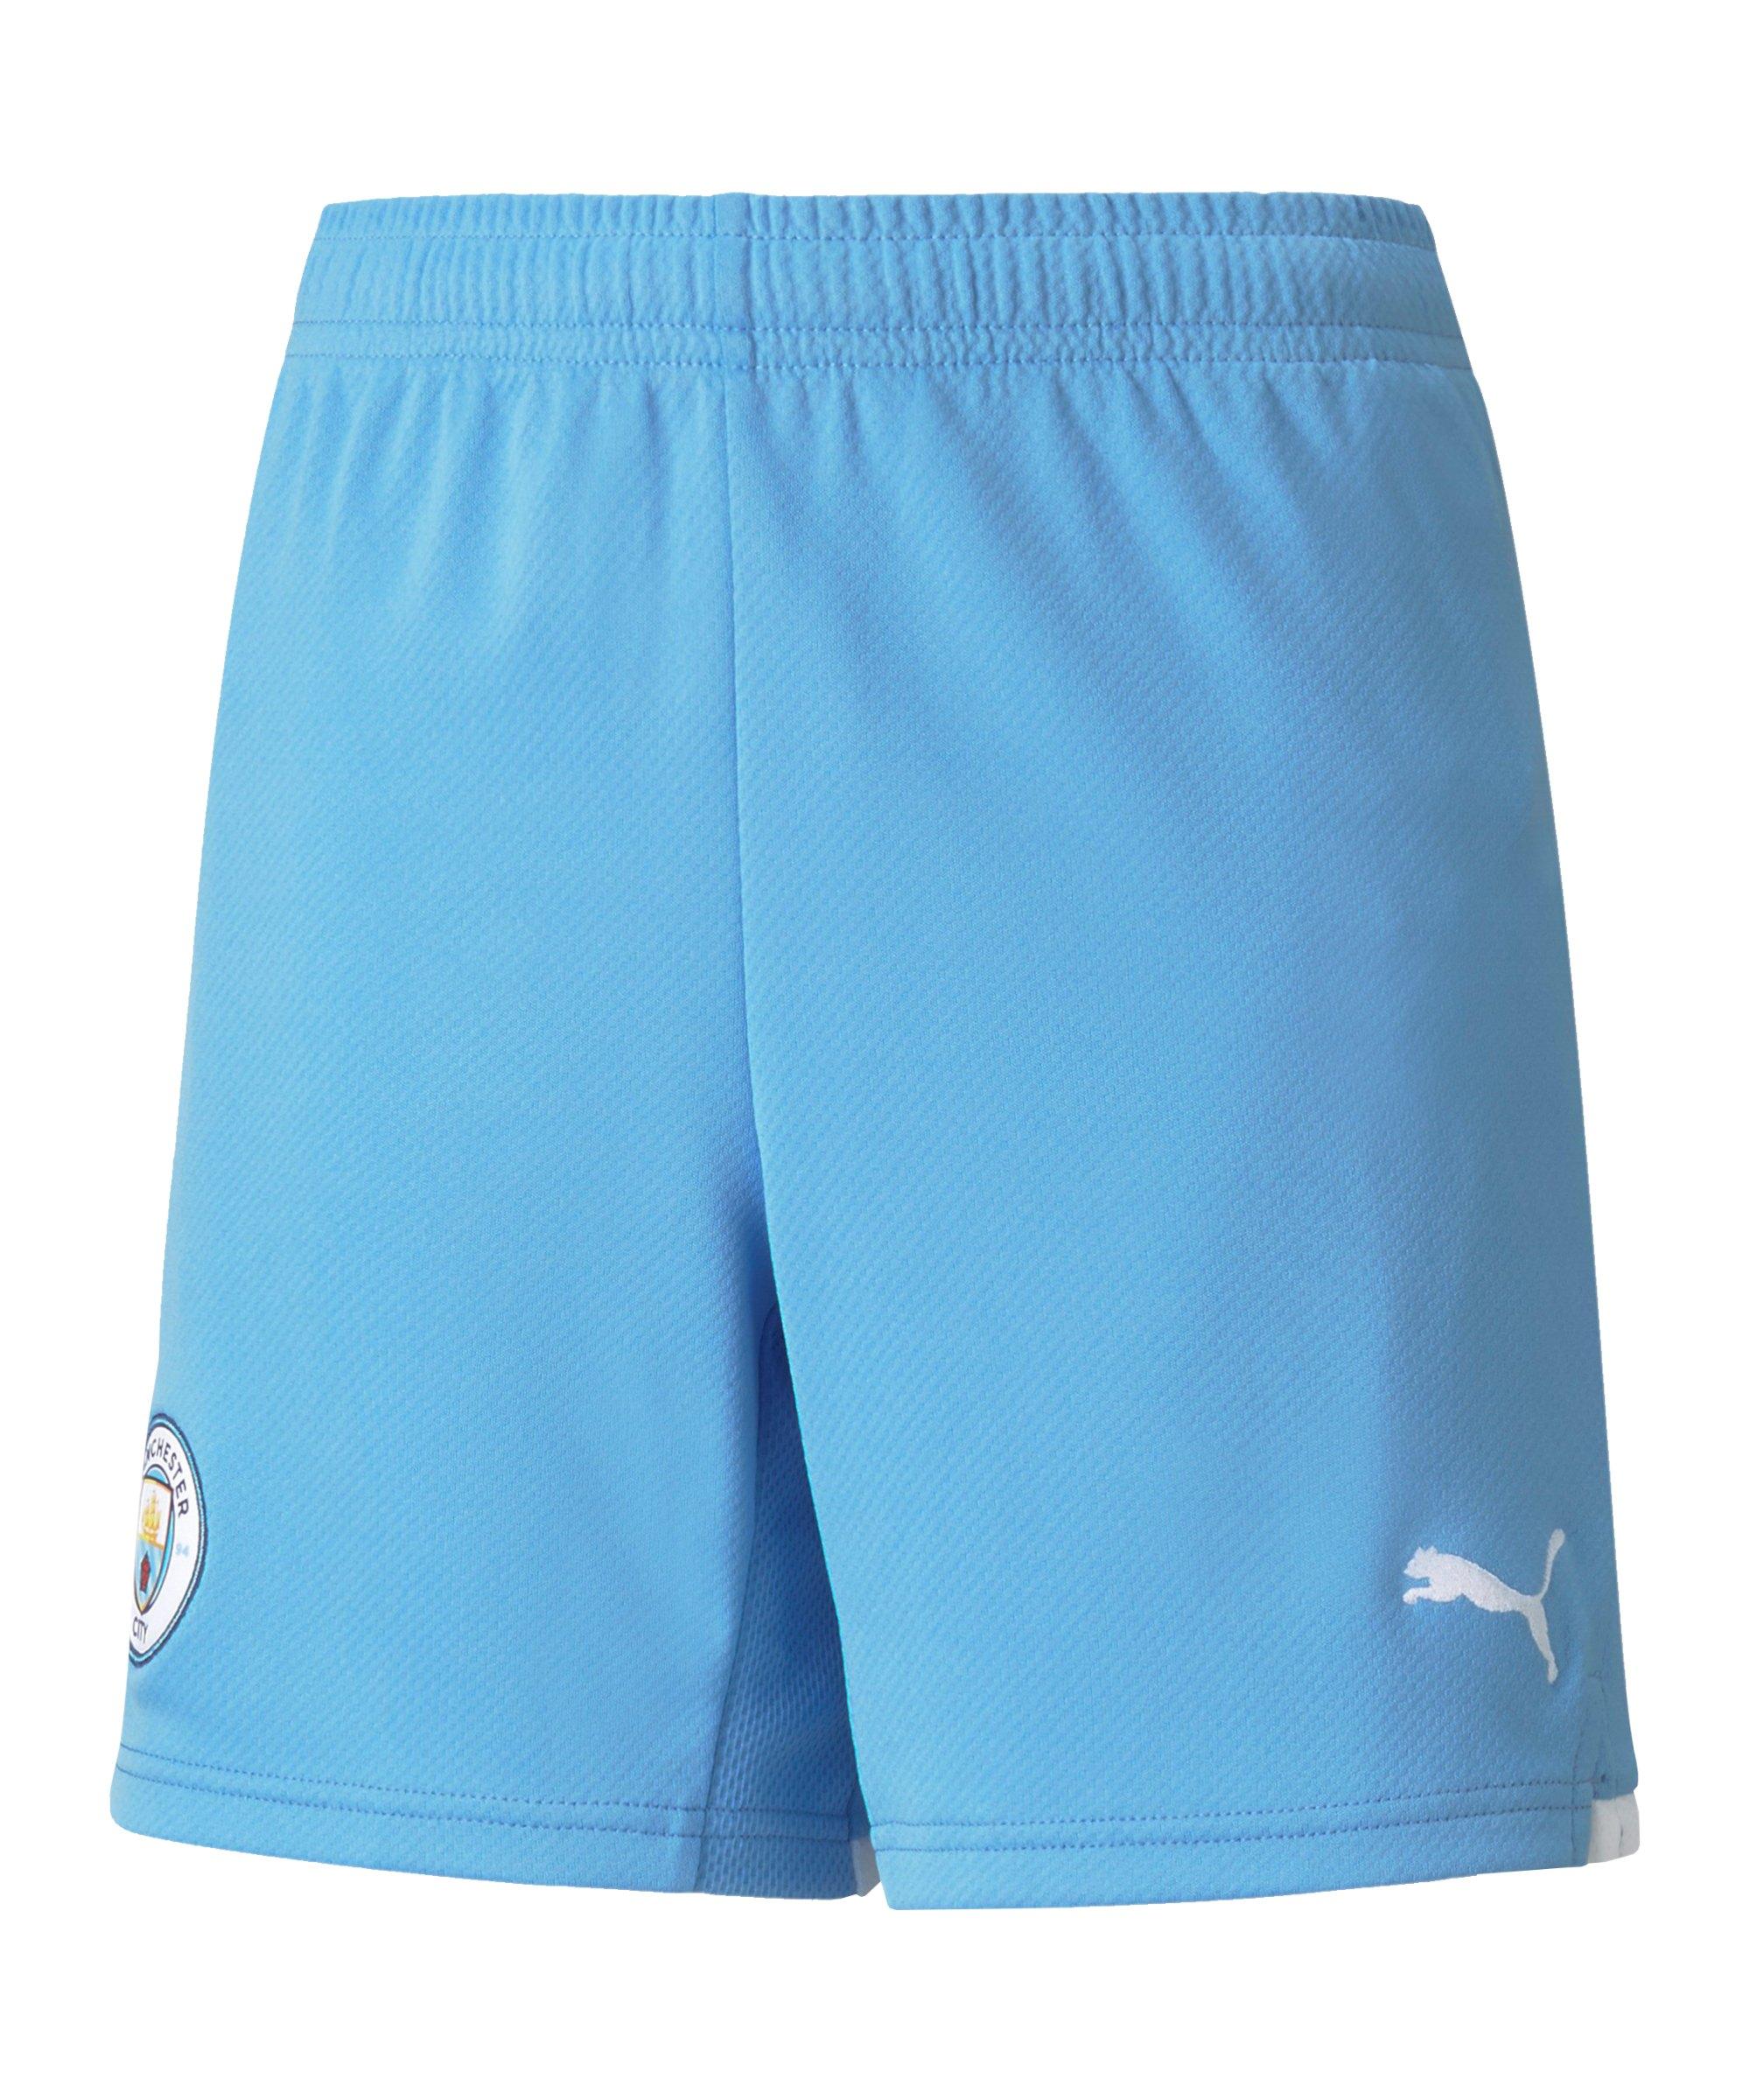 PUMA Manchester City Short Home 2021/2022 Kids Blau F01 - blau